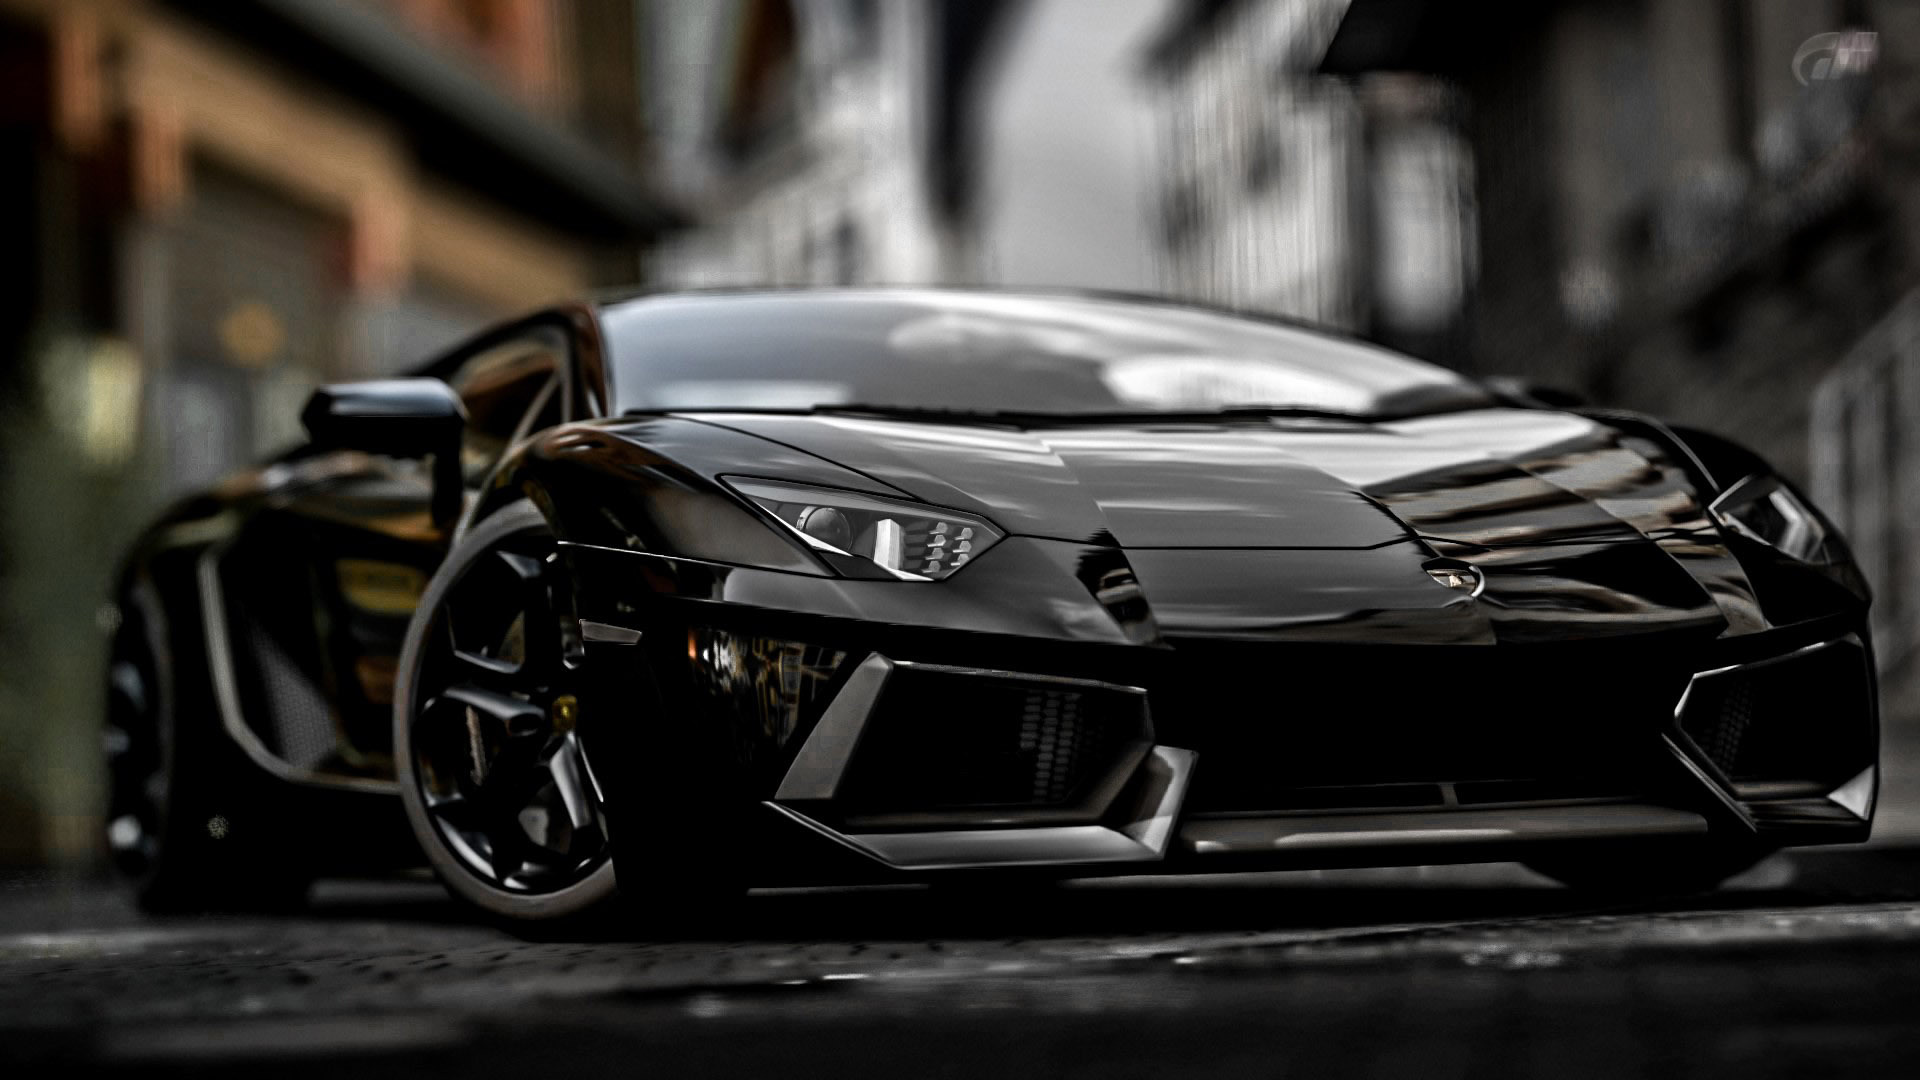 Lamborghini Wallpaper 18 1920x1080 768x432